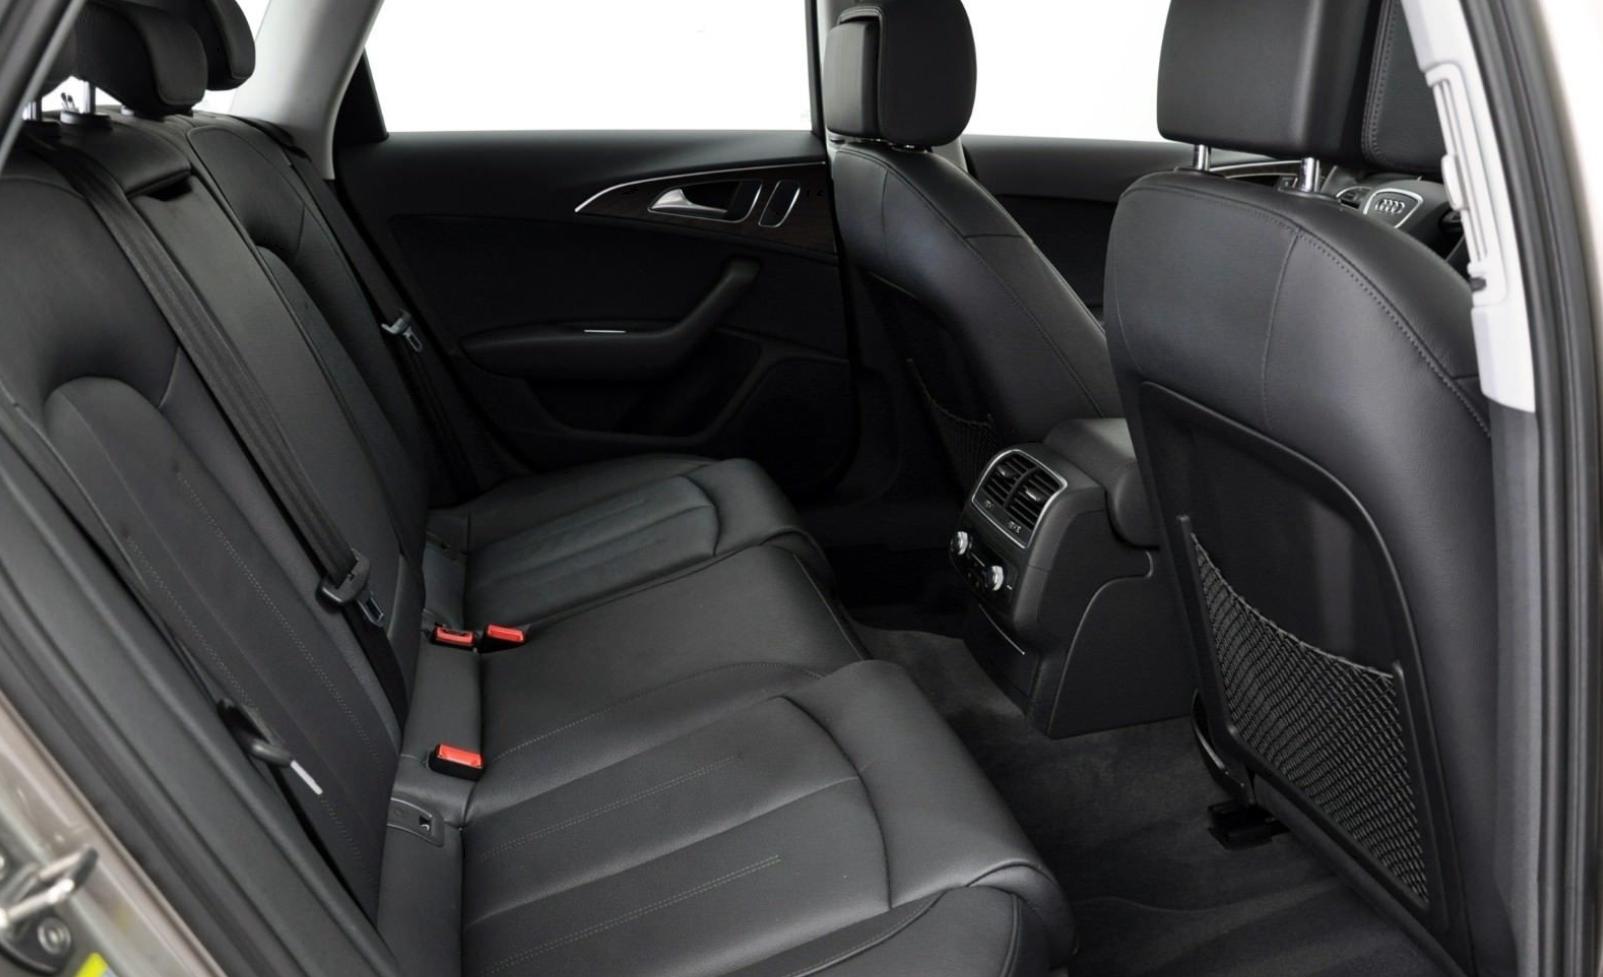 Audi A6 Avant 2.0 TDI quattro